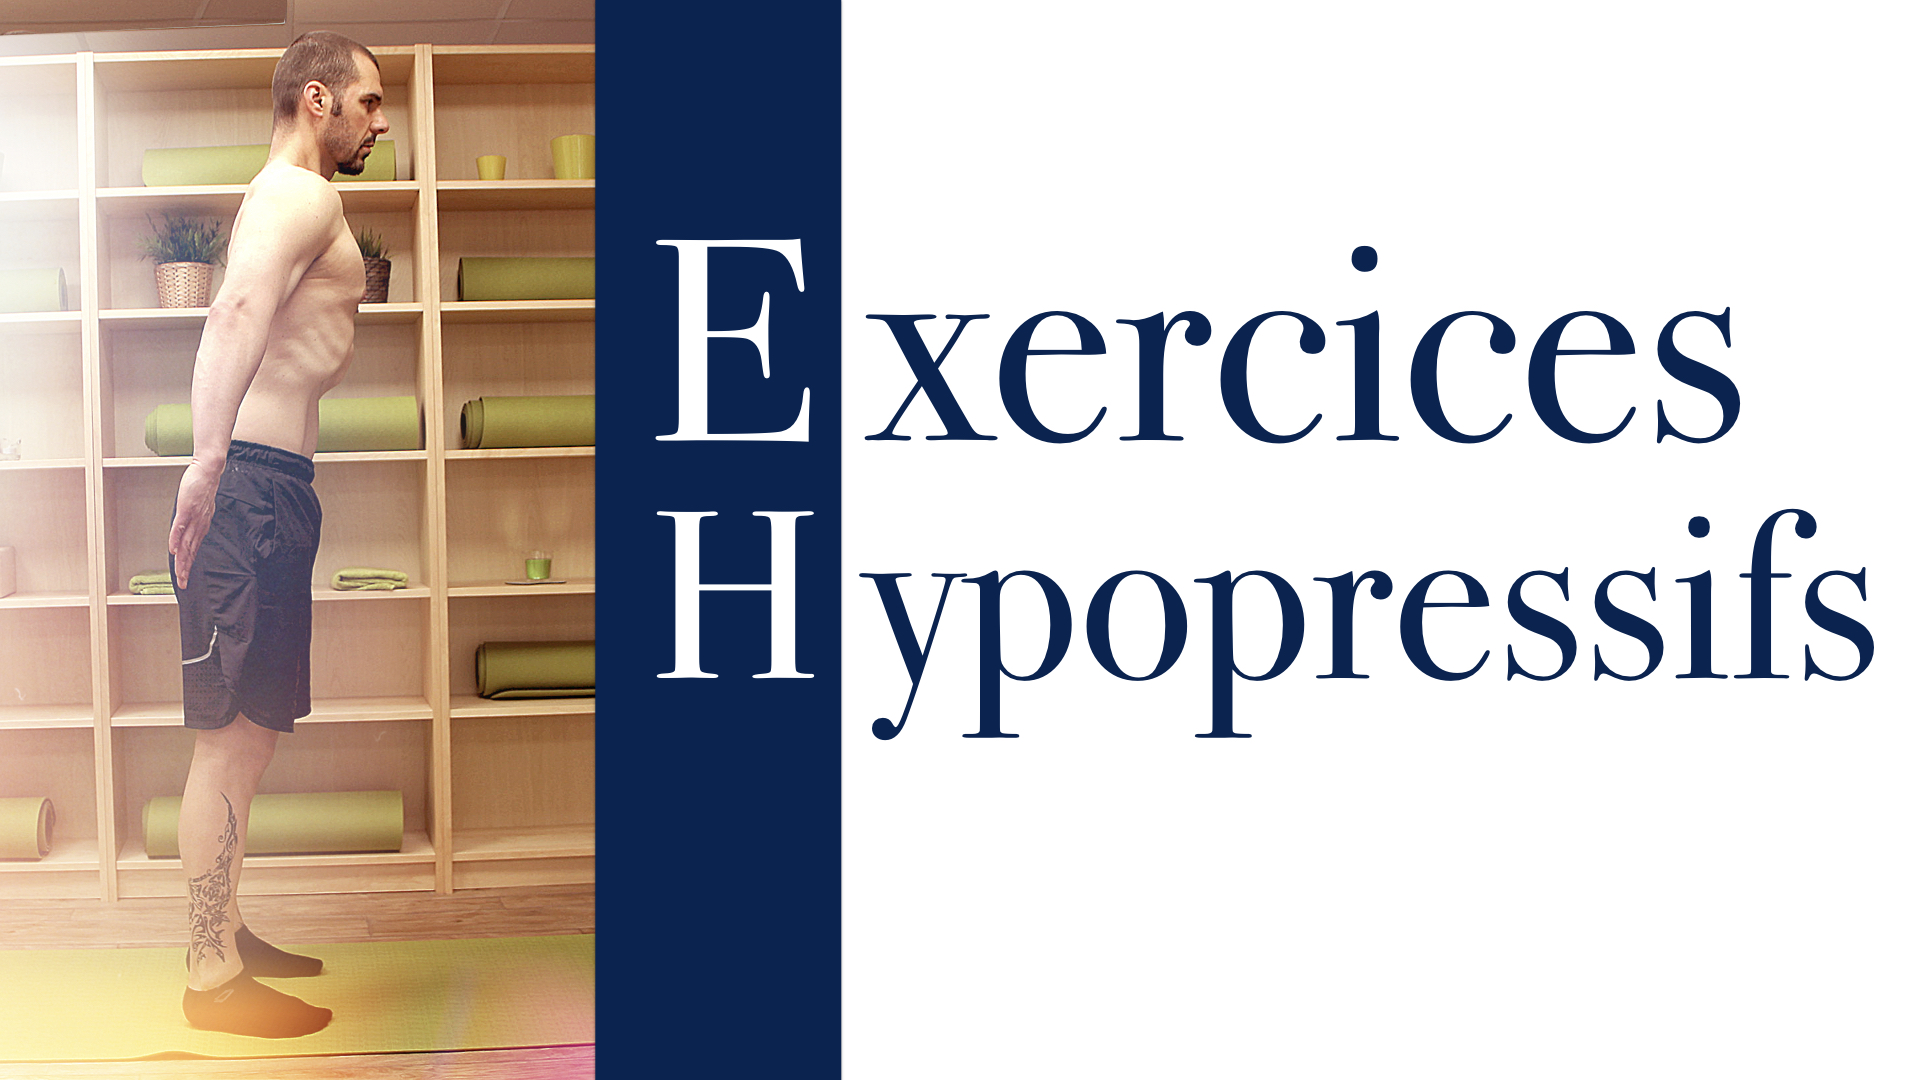 quelques exercices de gym hypopressive exercices hypopressifs. Black Bedroom Furniture Sets. Home Design Ideas